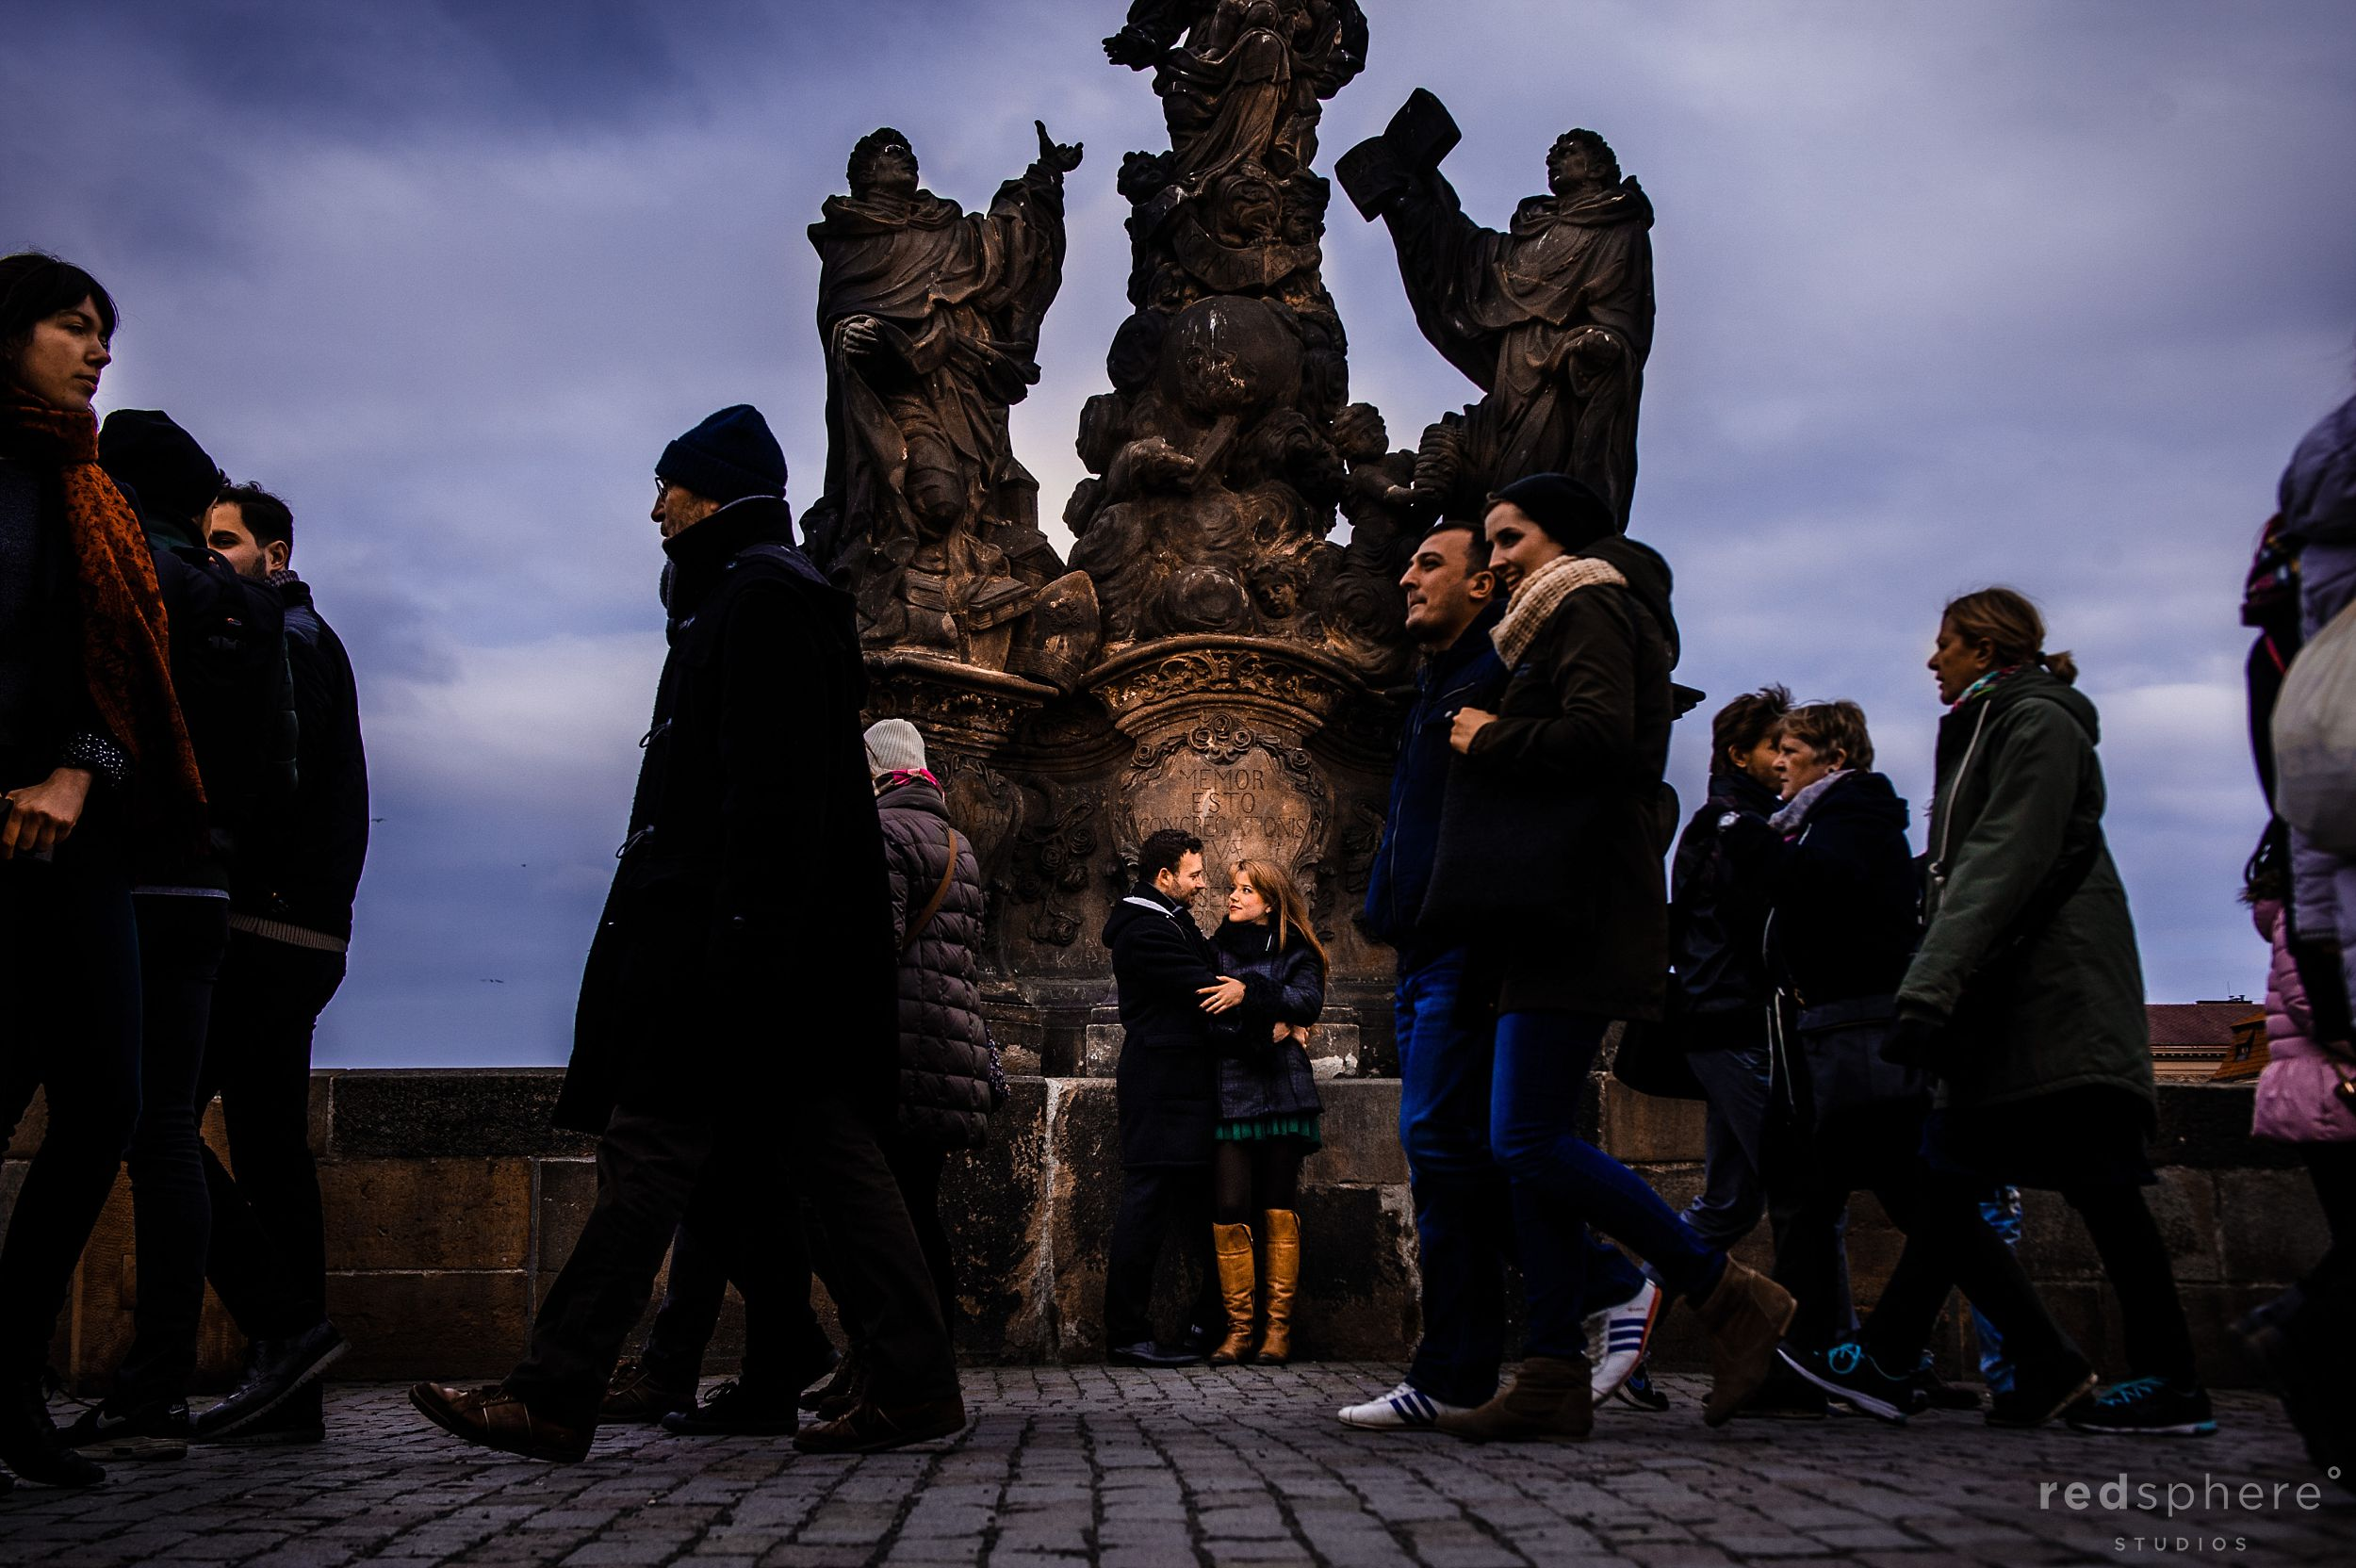 Couple Engagement at Charles Bridge, Prague